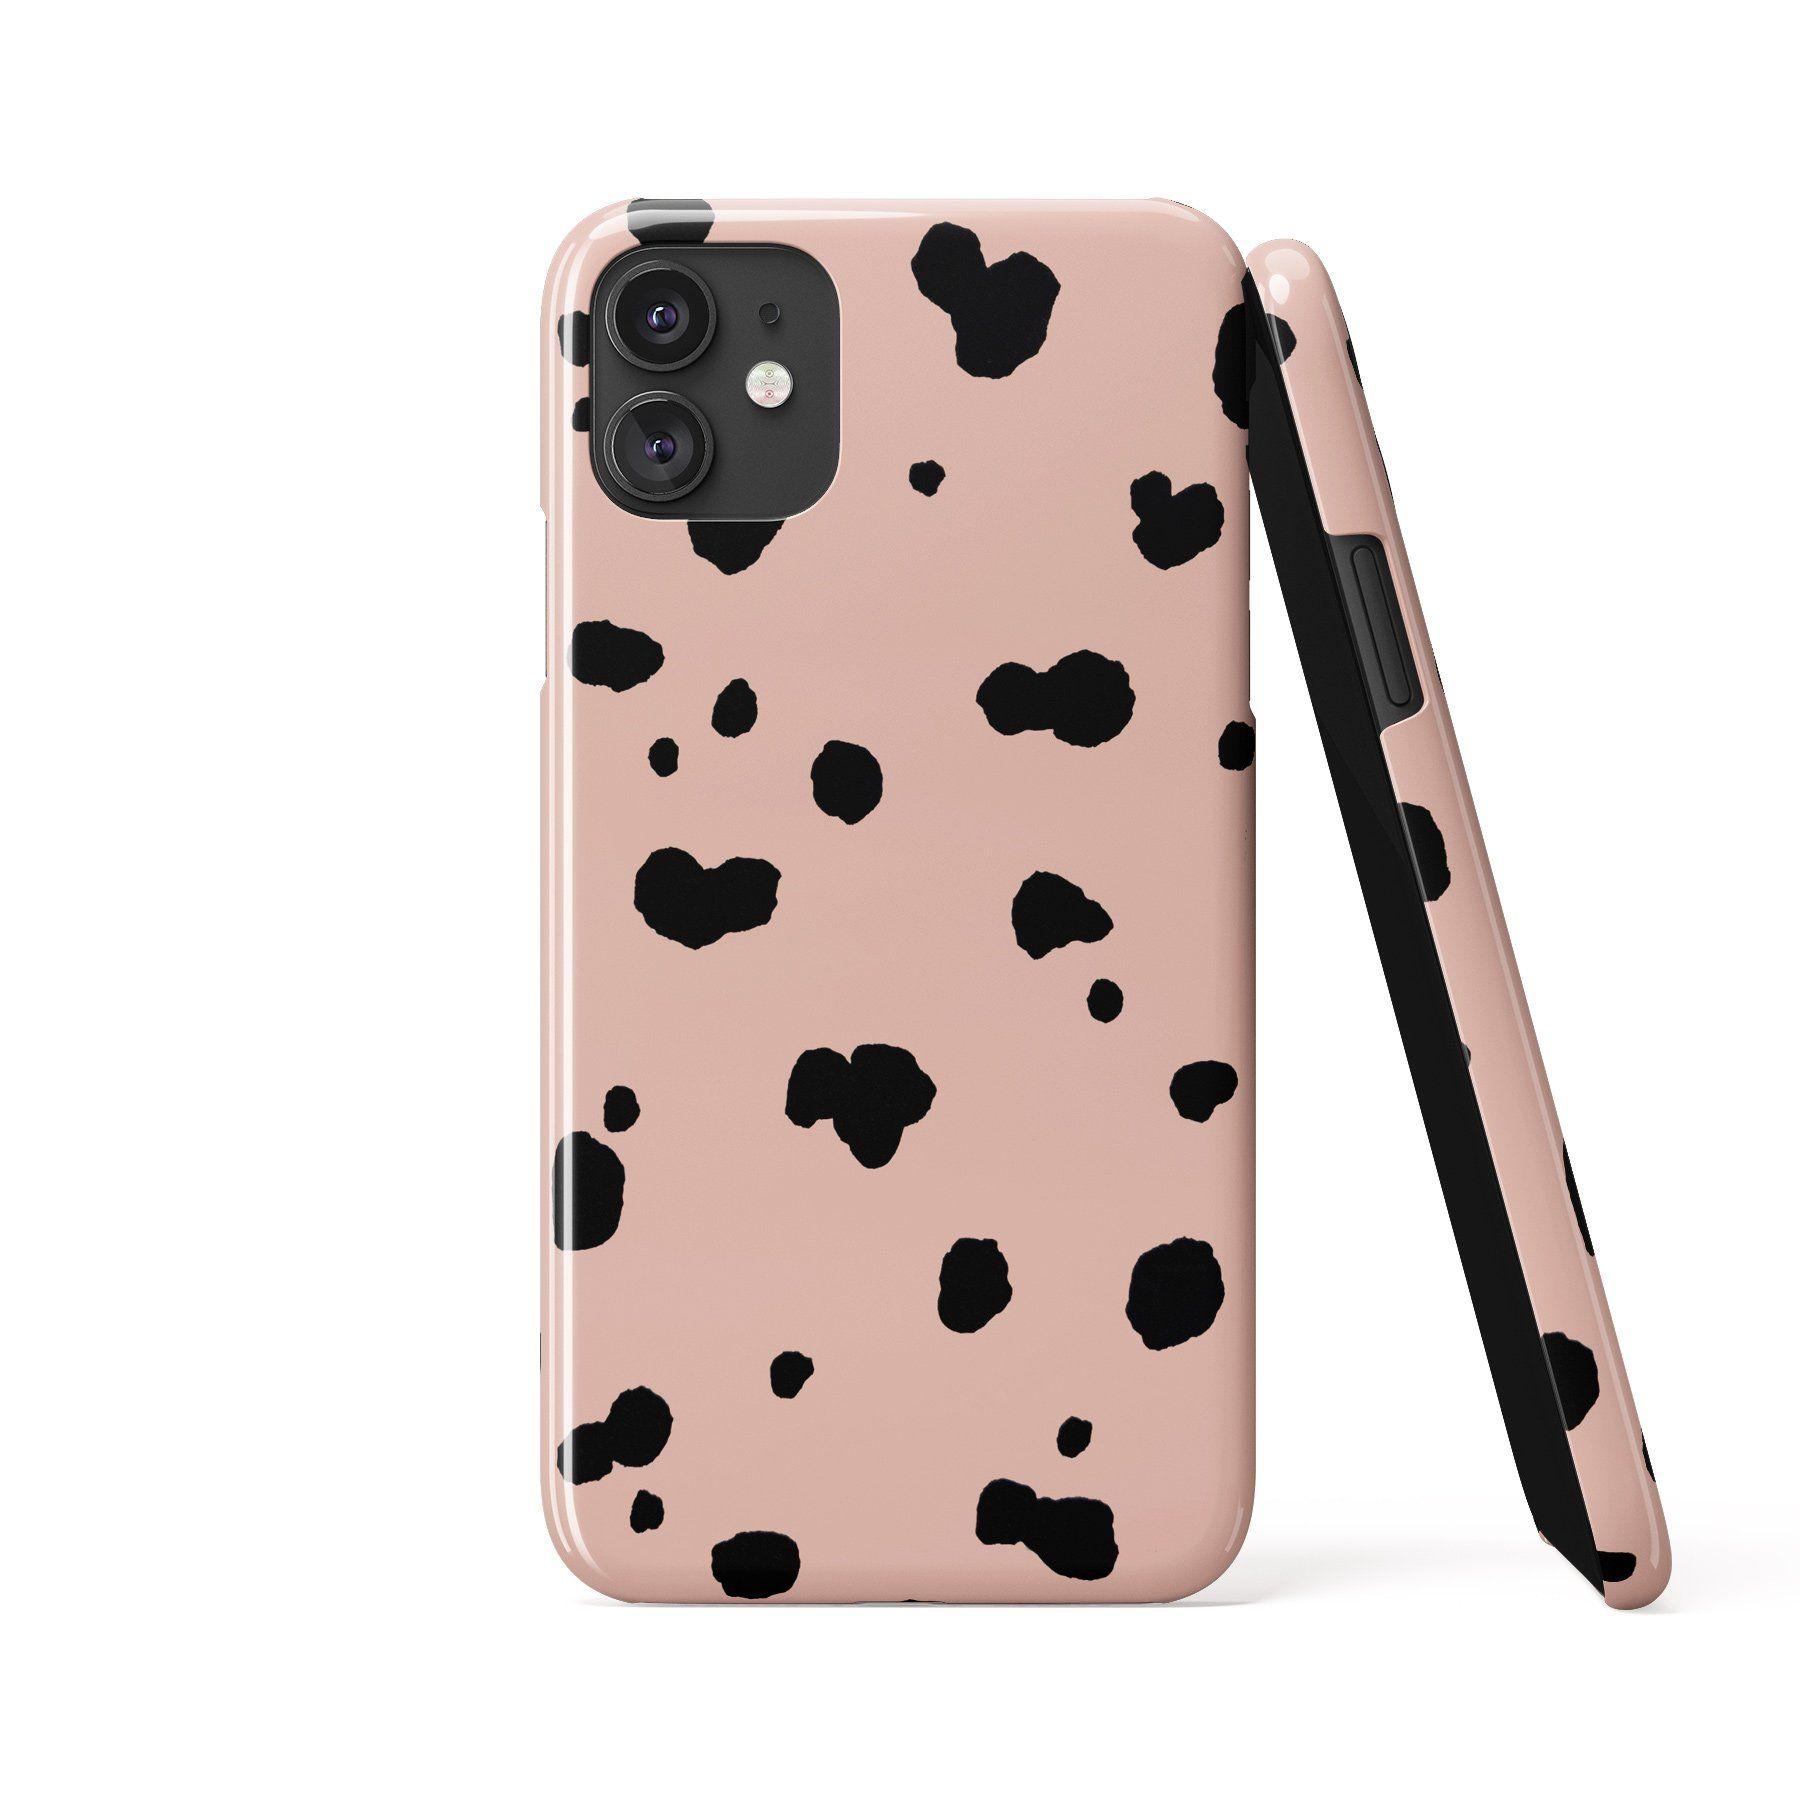 DALMATIAN Cavern Pink Phone Case - iPhone 13 / Tough Case - Gloss